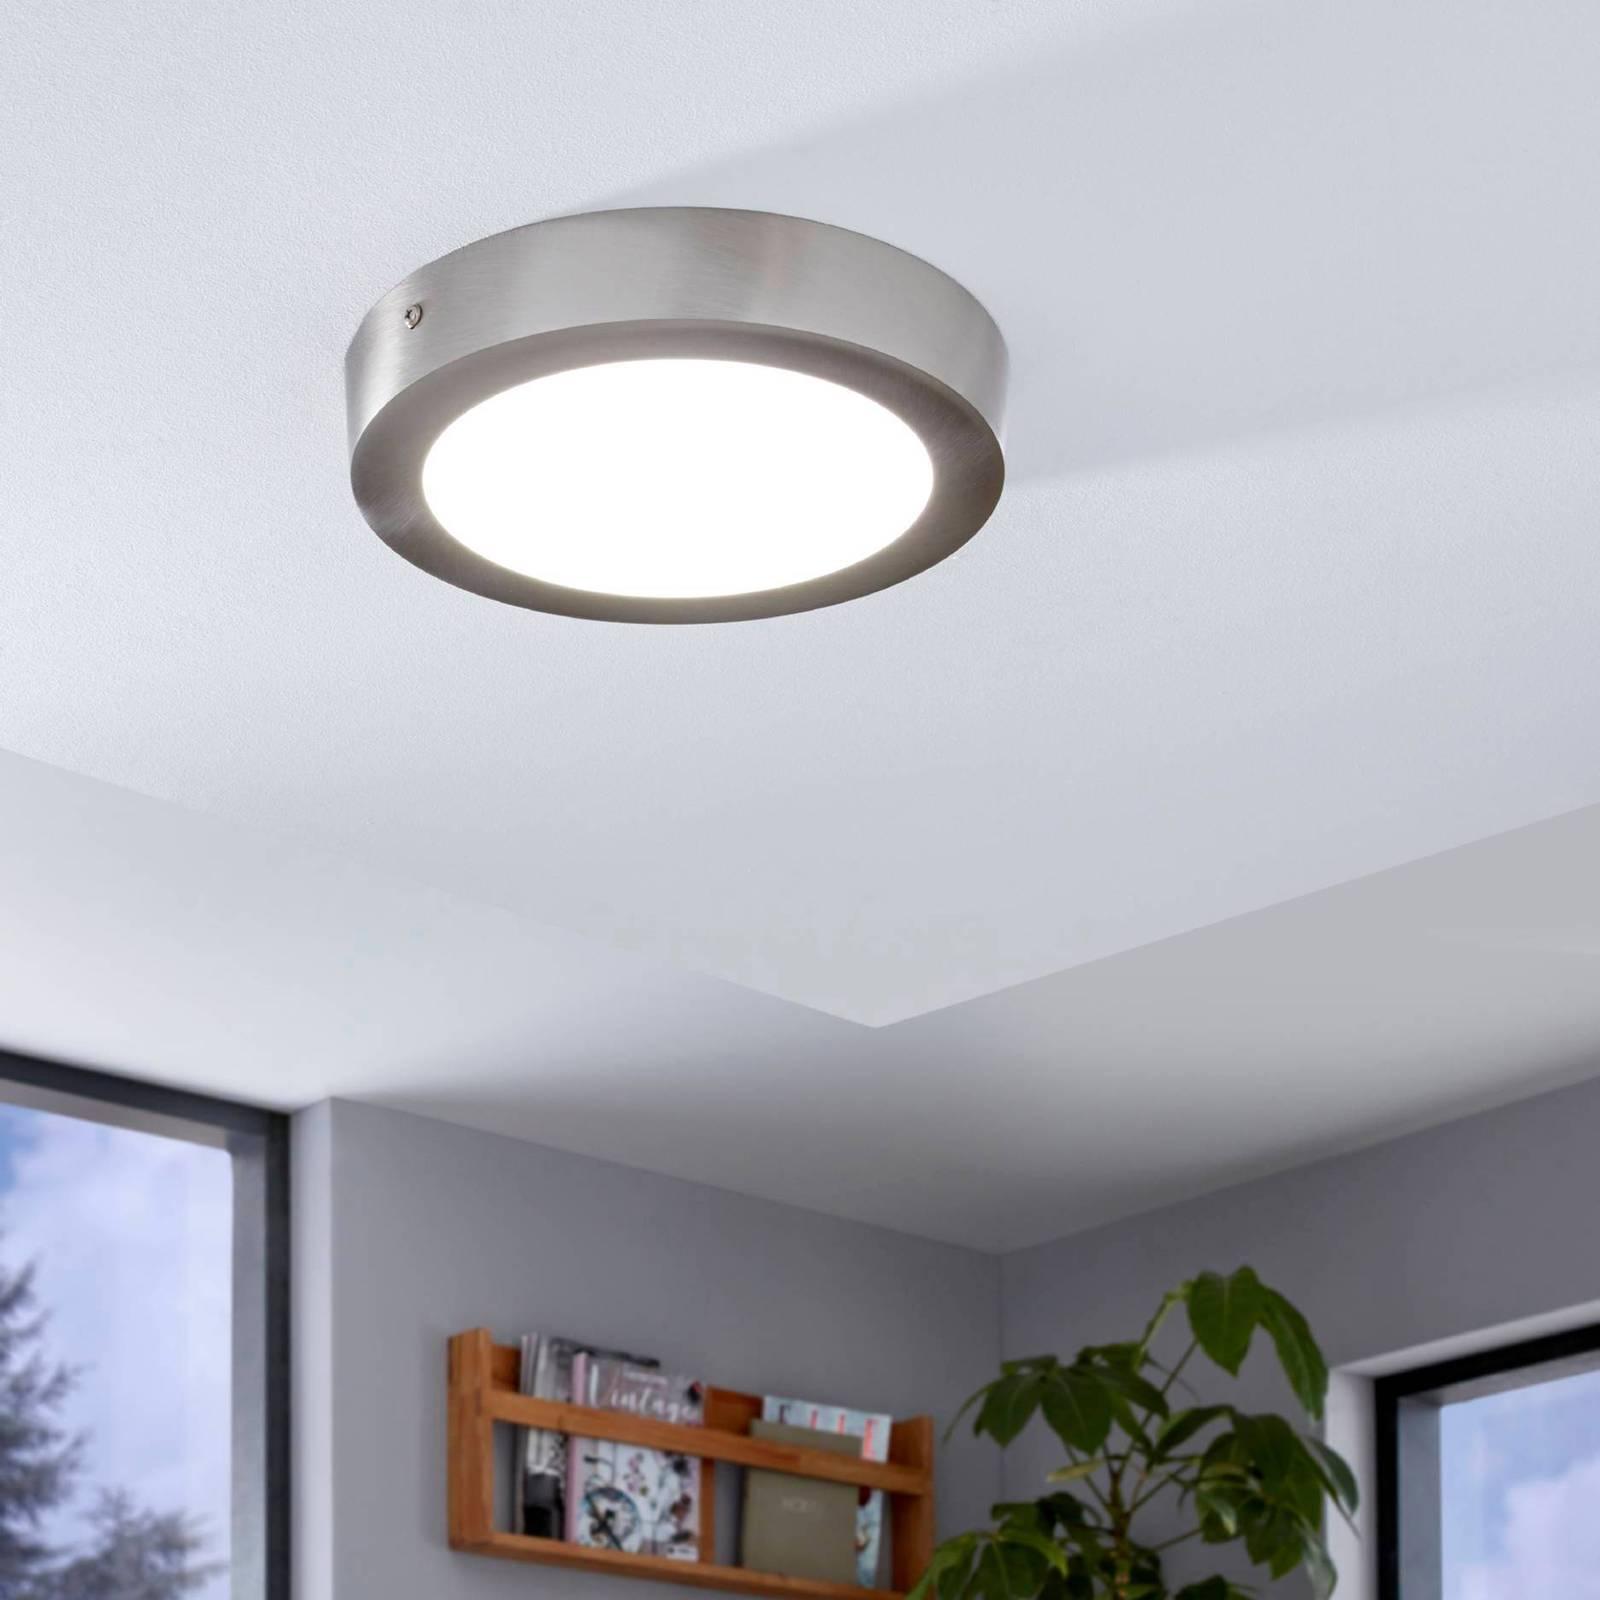 Fueva-Connect LED-kattovalaisin, 22,5 cm, nikkeli